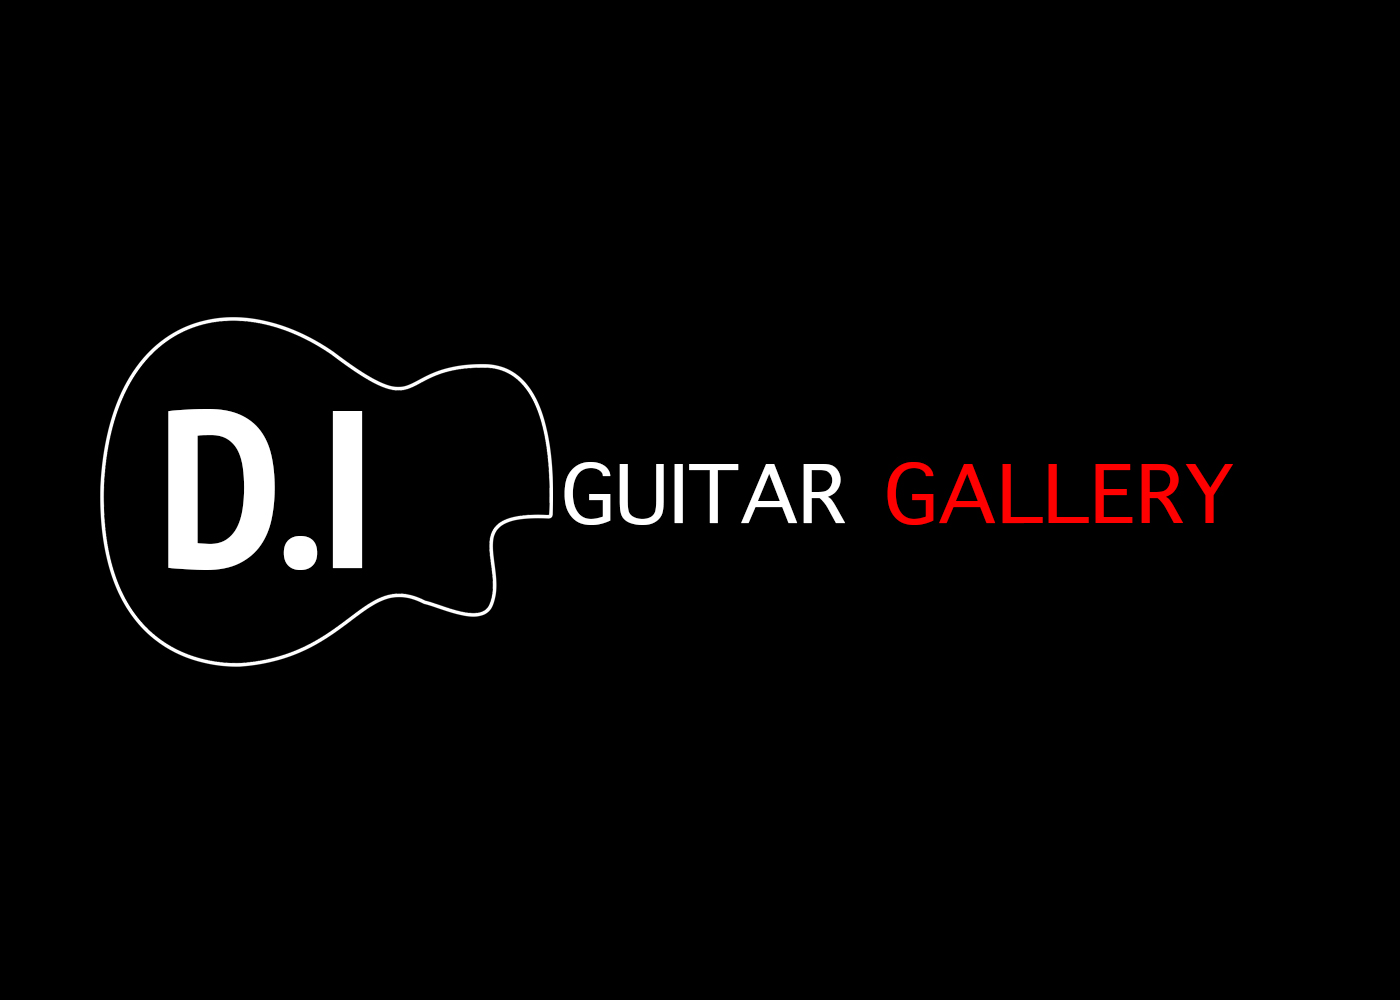 D I guitar gallery